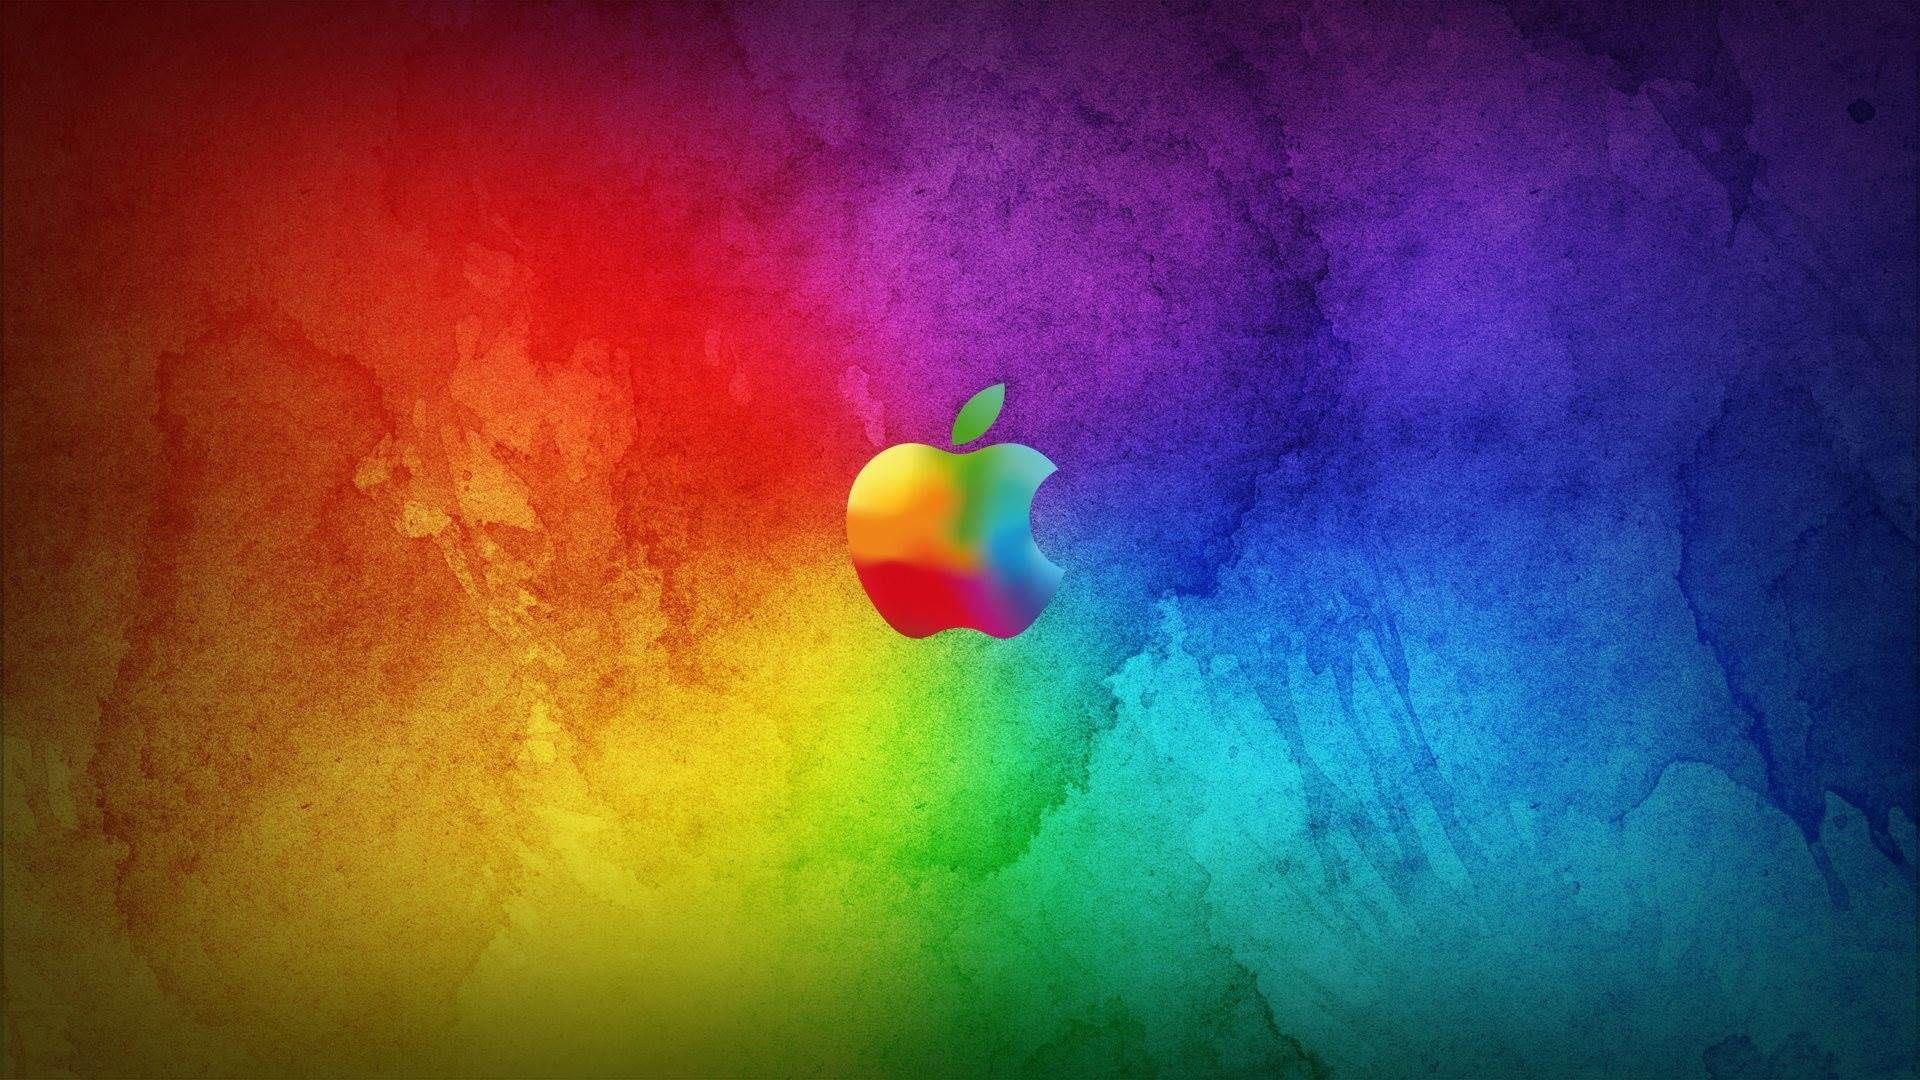 Apple HD Wallpapers Logo Desktop Backgrounds Page